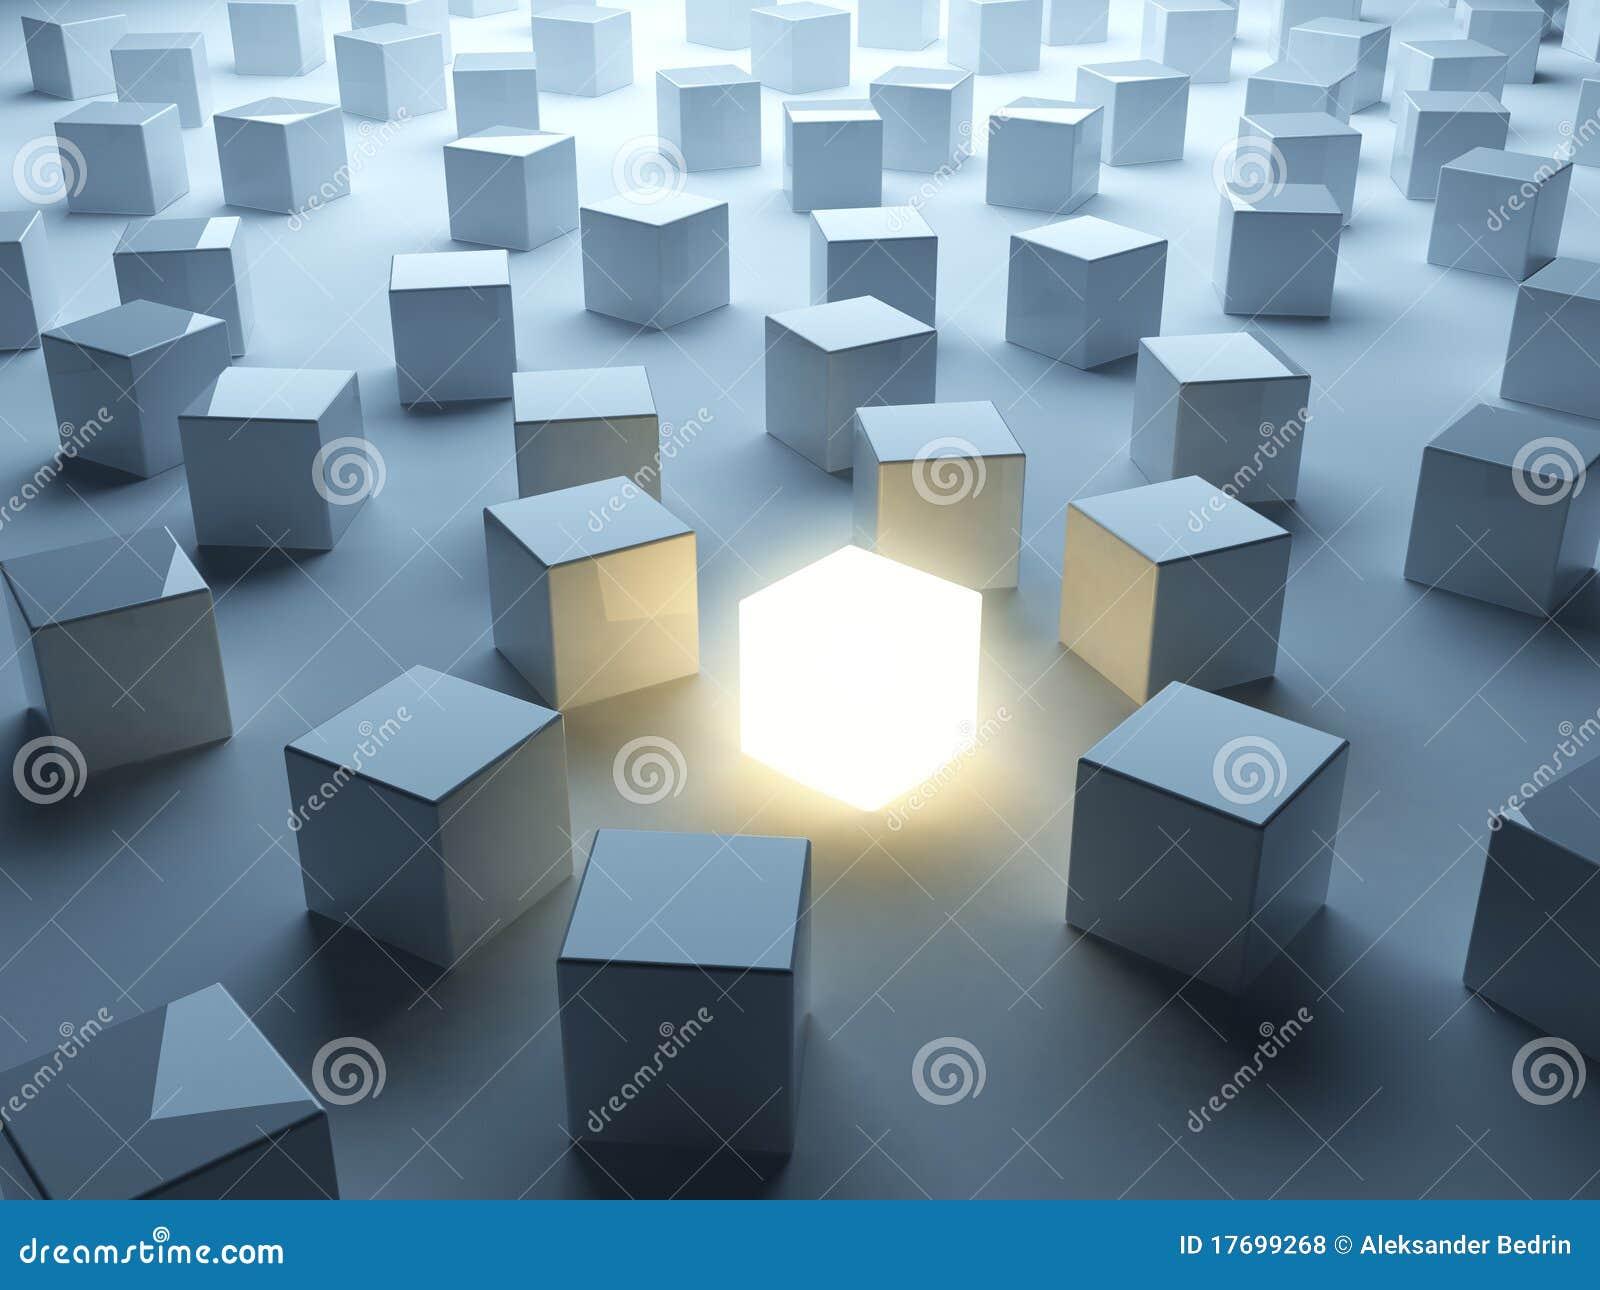 Cube lumineux. Individualité